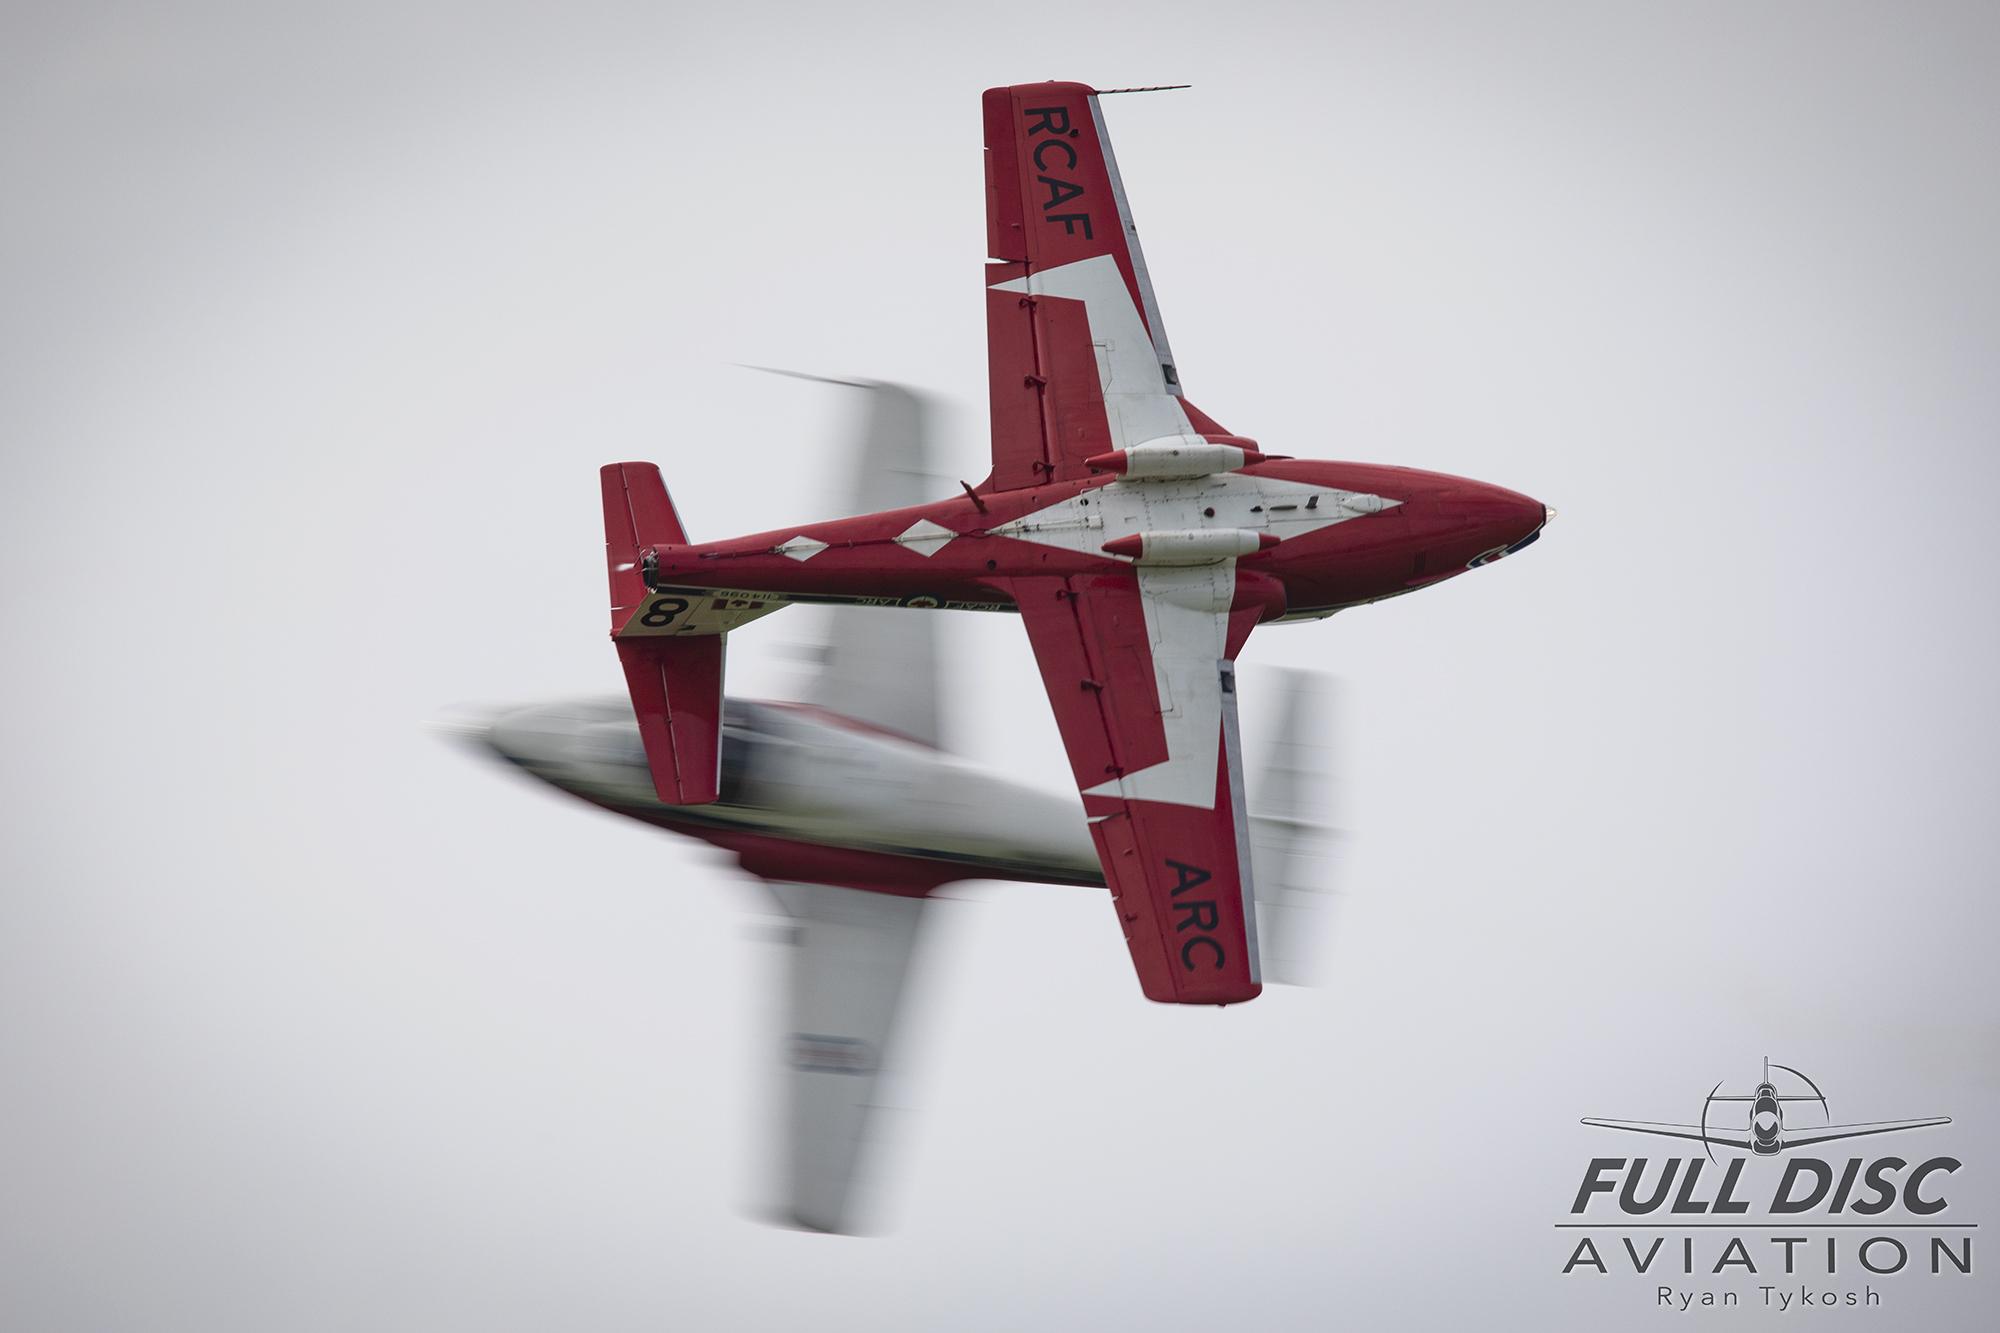 lbe19-fdartykosh-sbirds-opposingcross.jpg